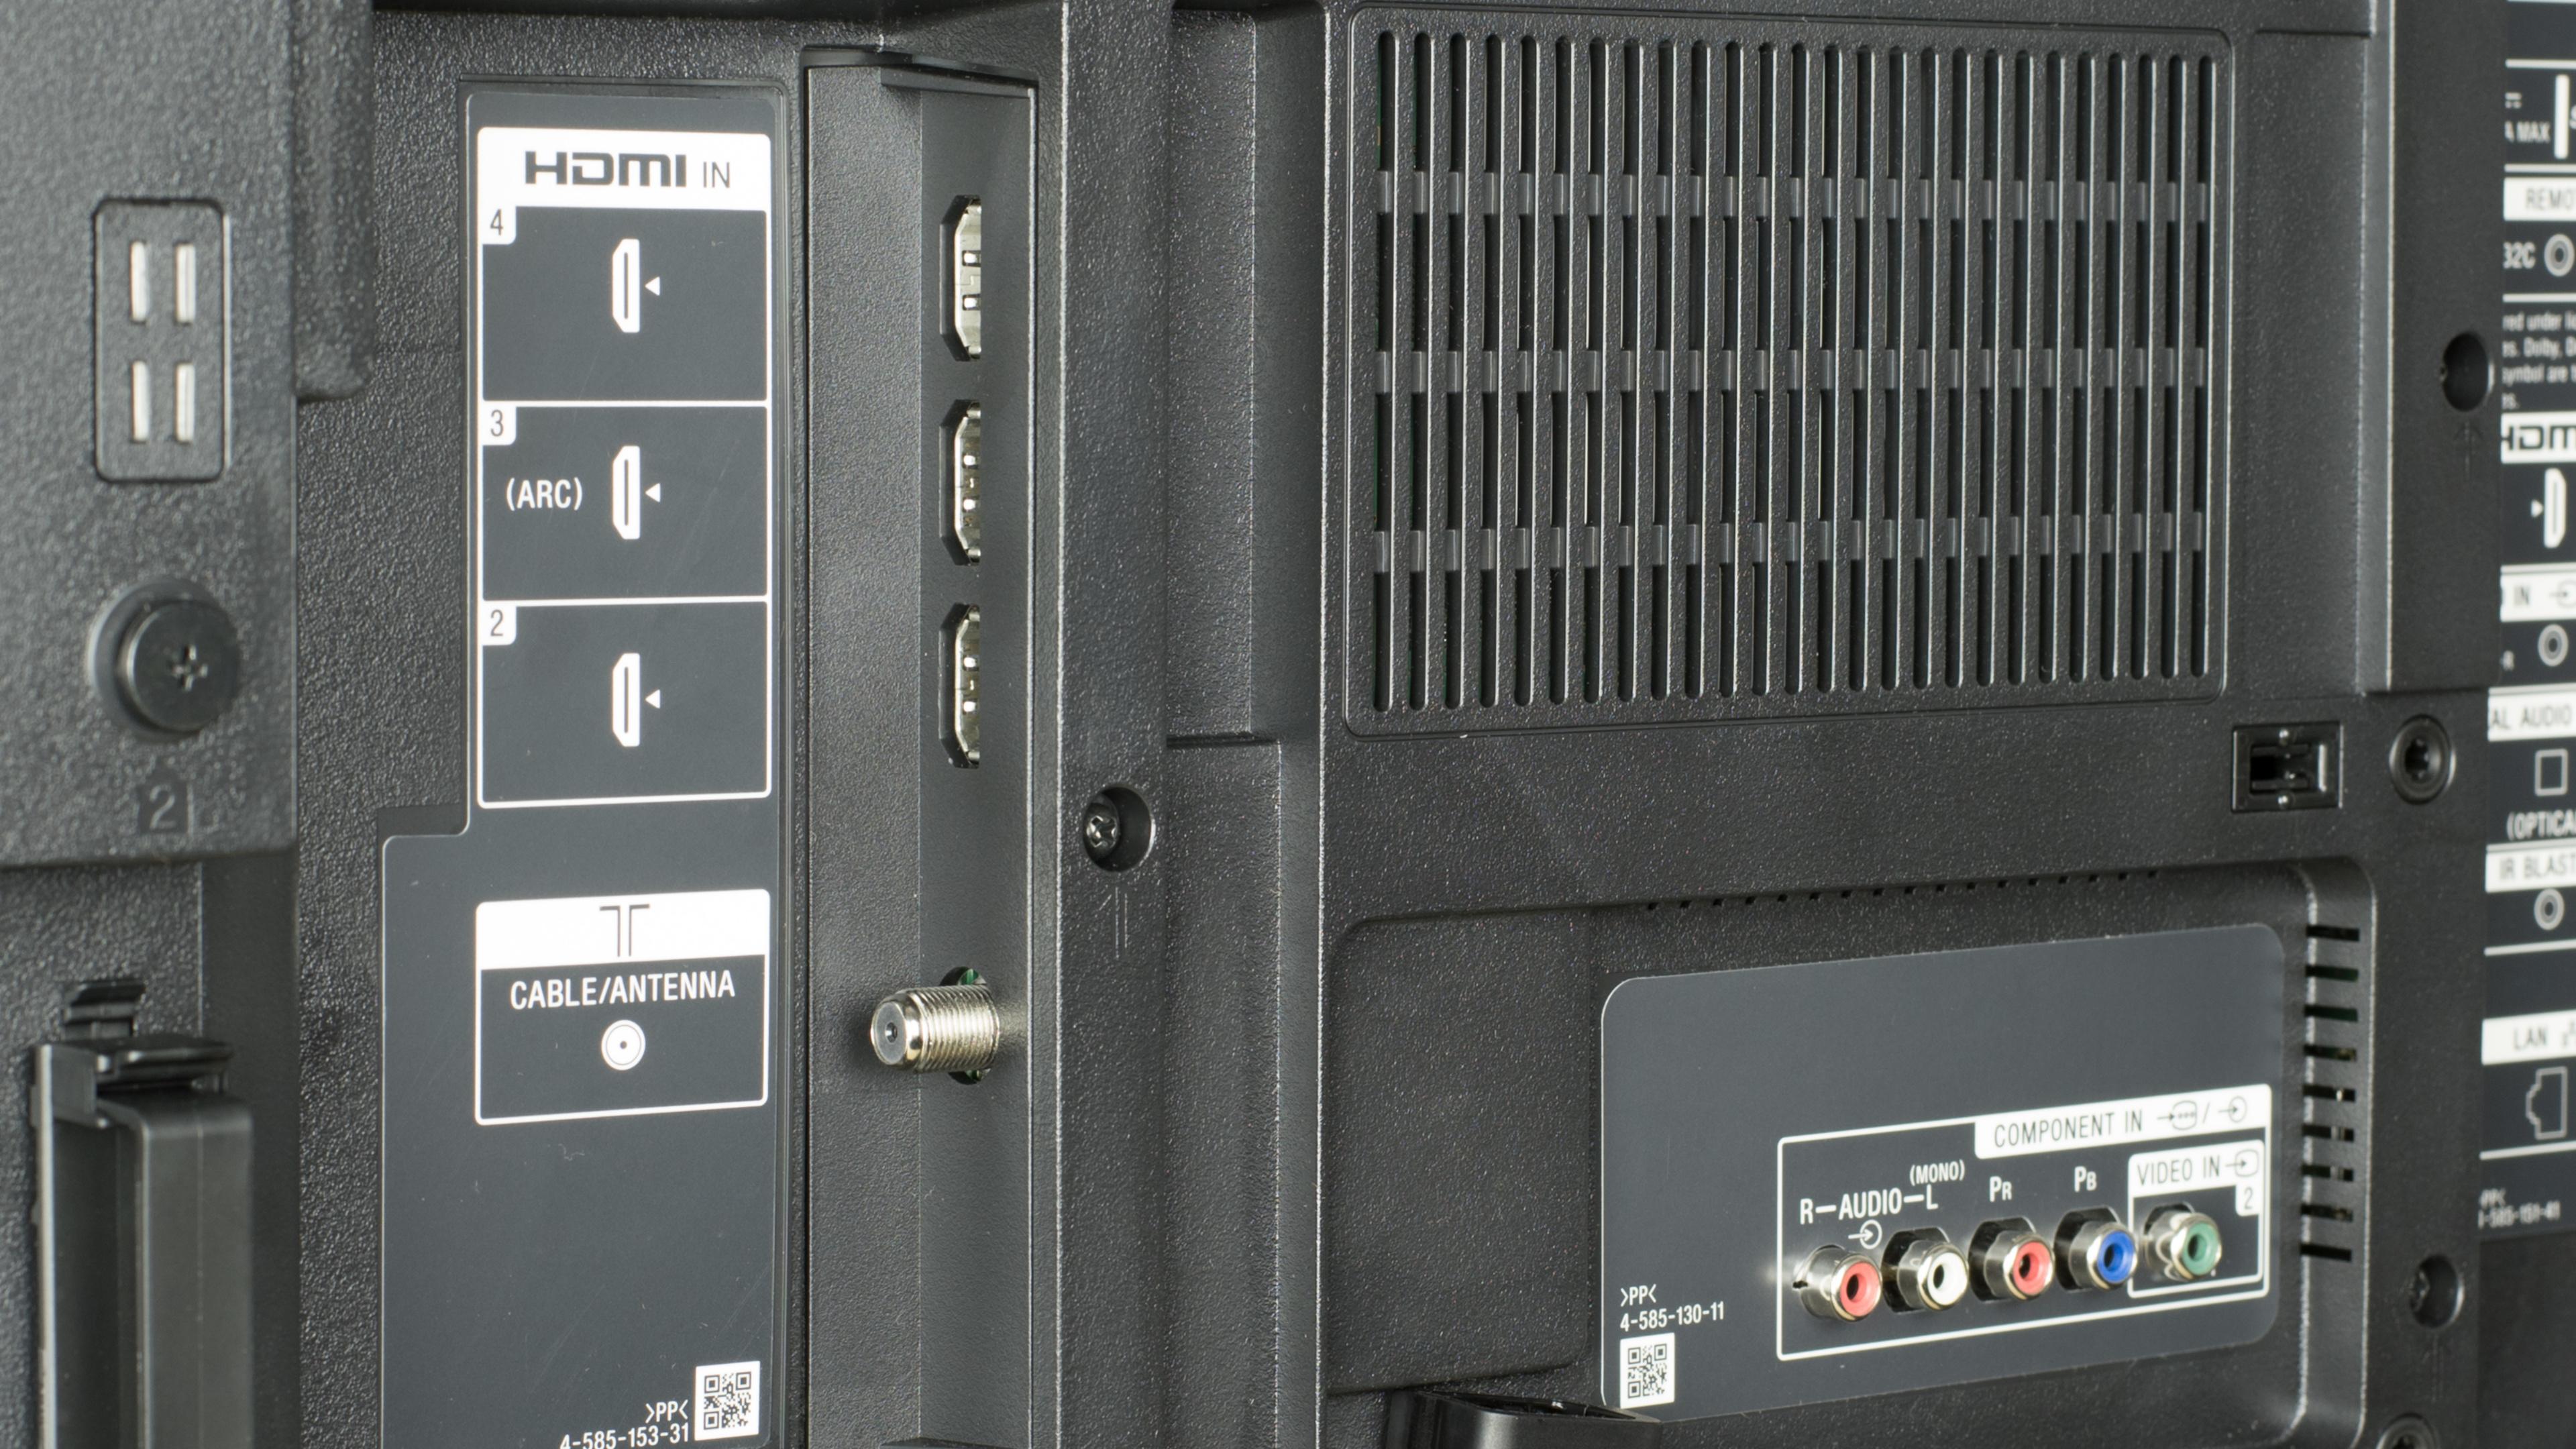 Sony Z9d Review Xbr65z9d Xbr75z9d Xbr100z9d